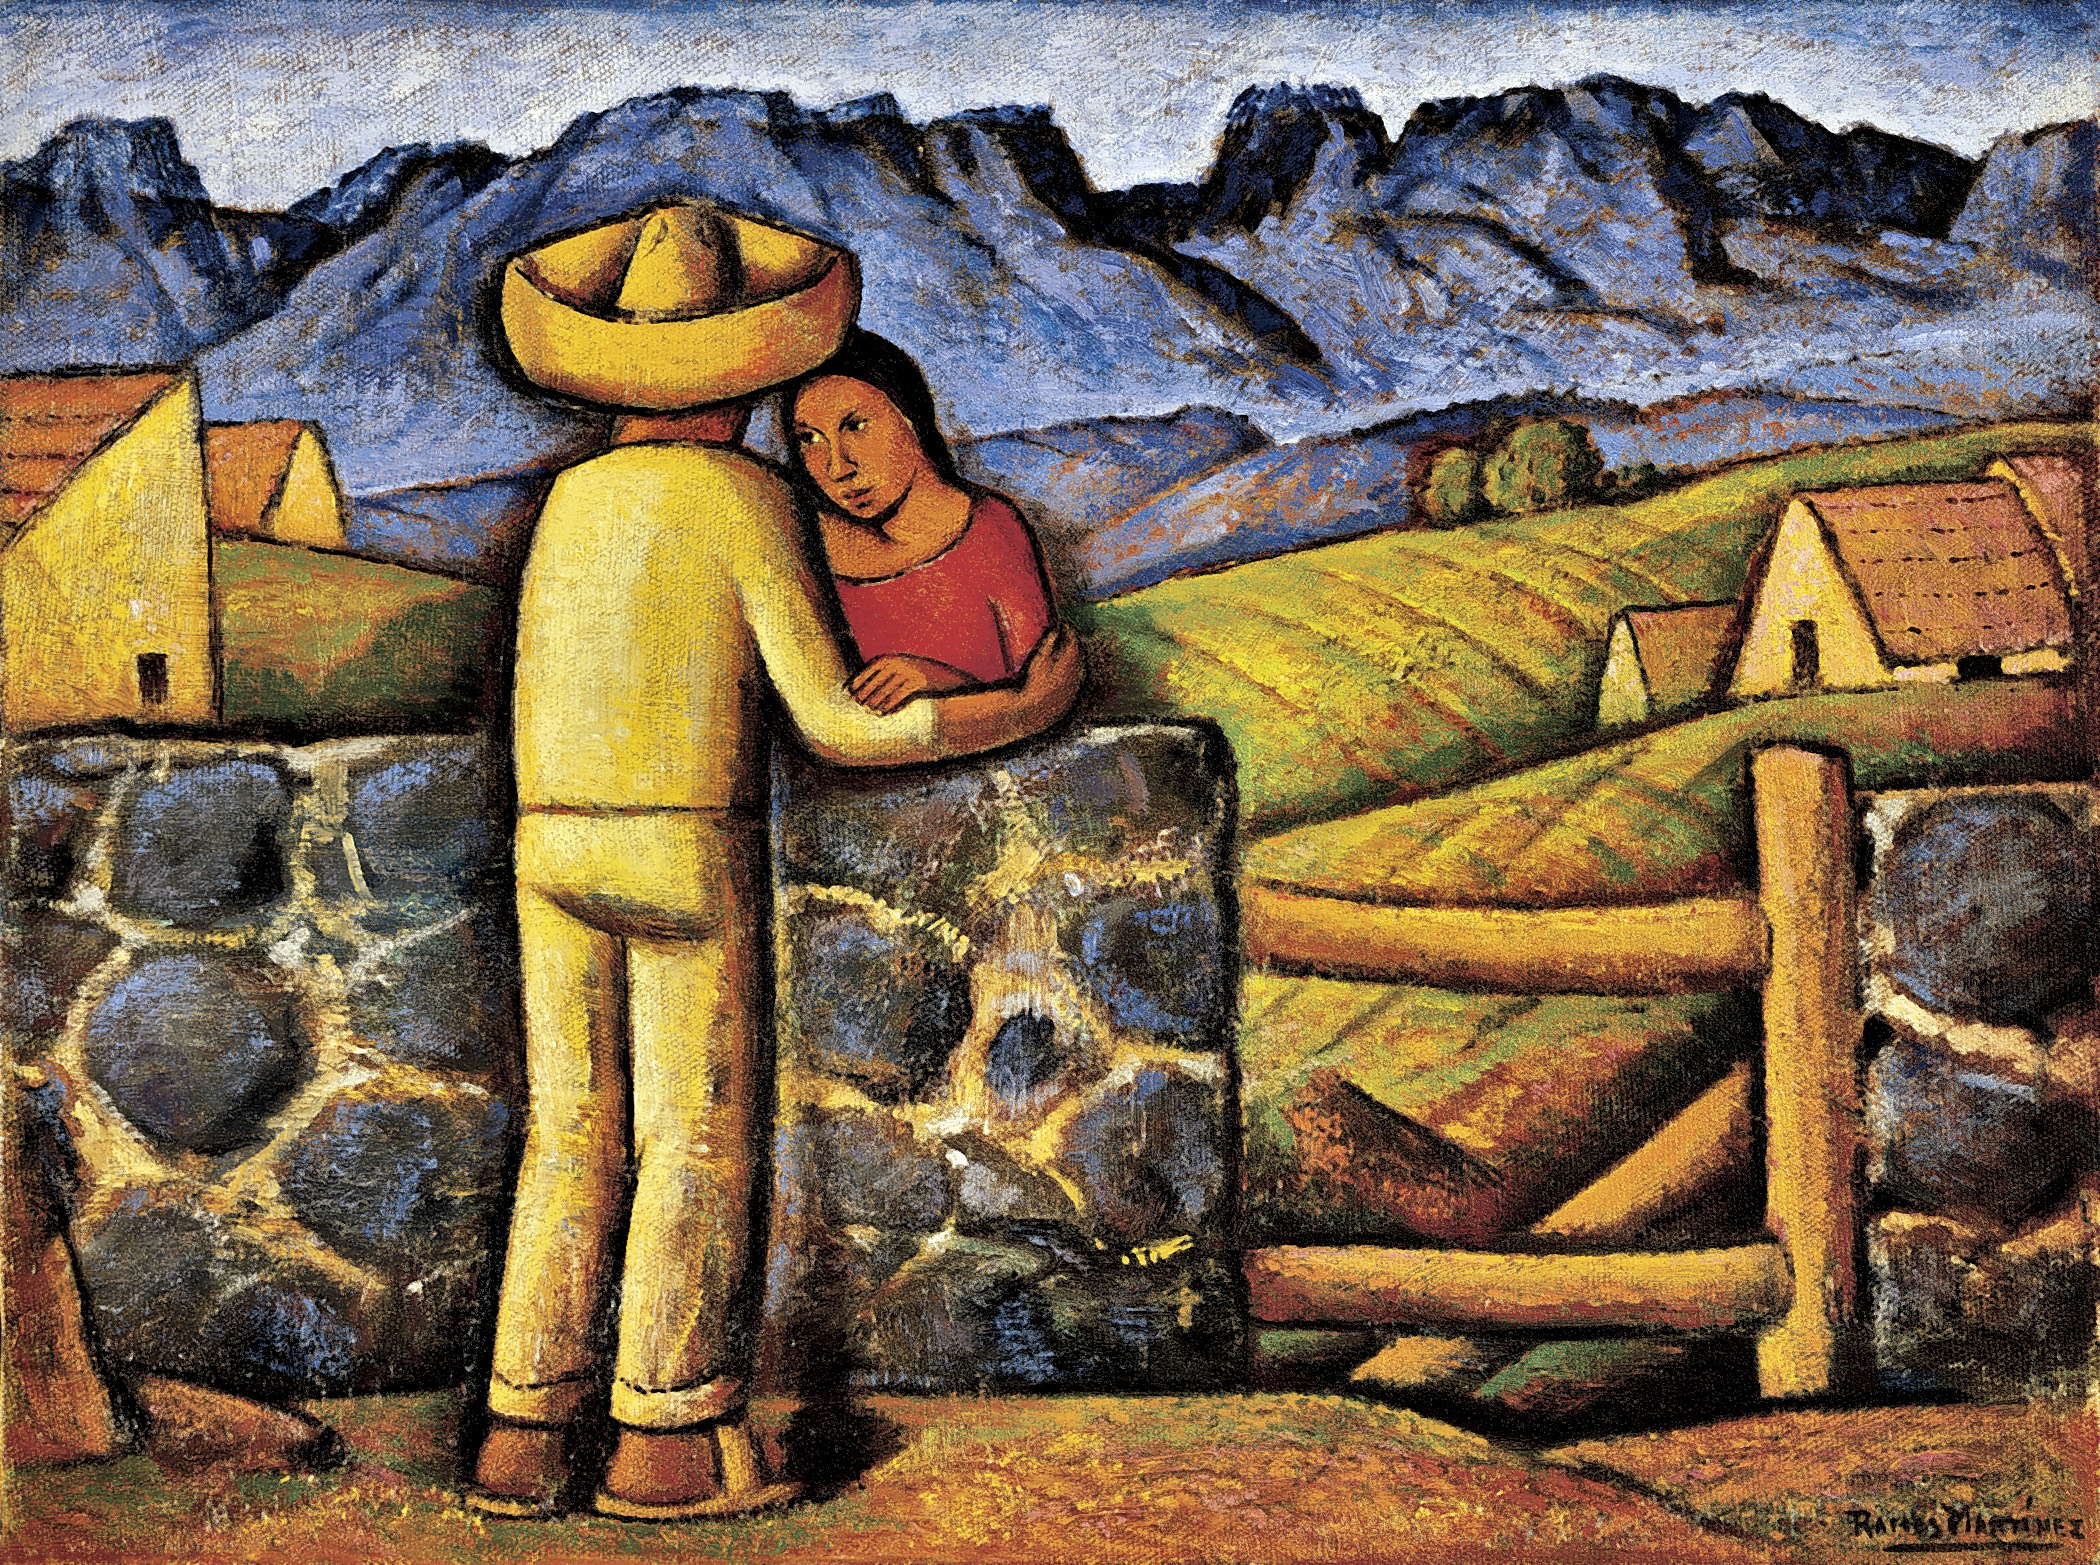 Los Novios / The Sweethearts  ca. 1941 oil on canvas / óleo sobre tela 15 x 20 inches; 38.1 x 50.8 centímetros San Diego Museum of Art